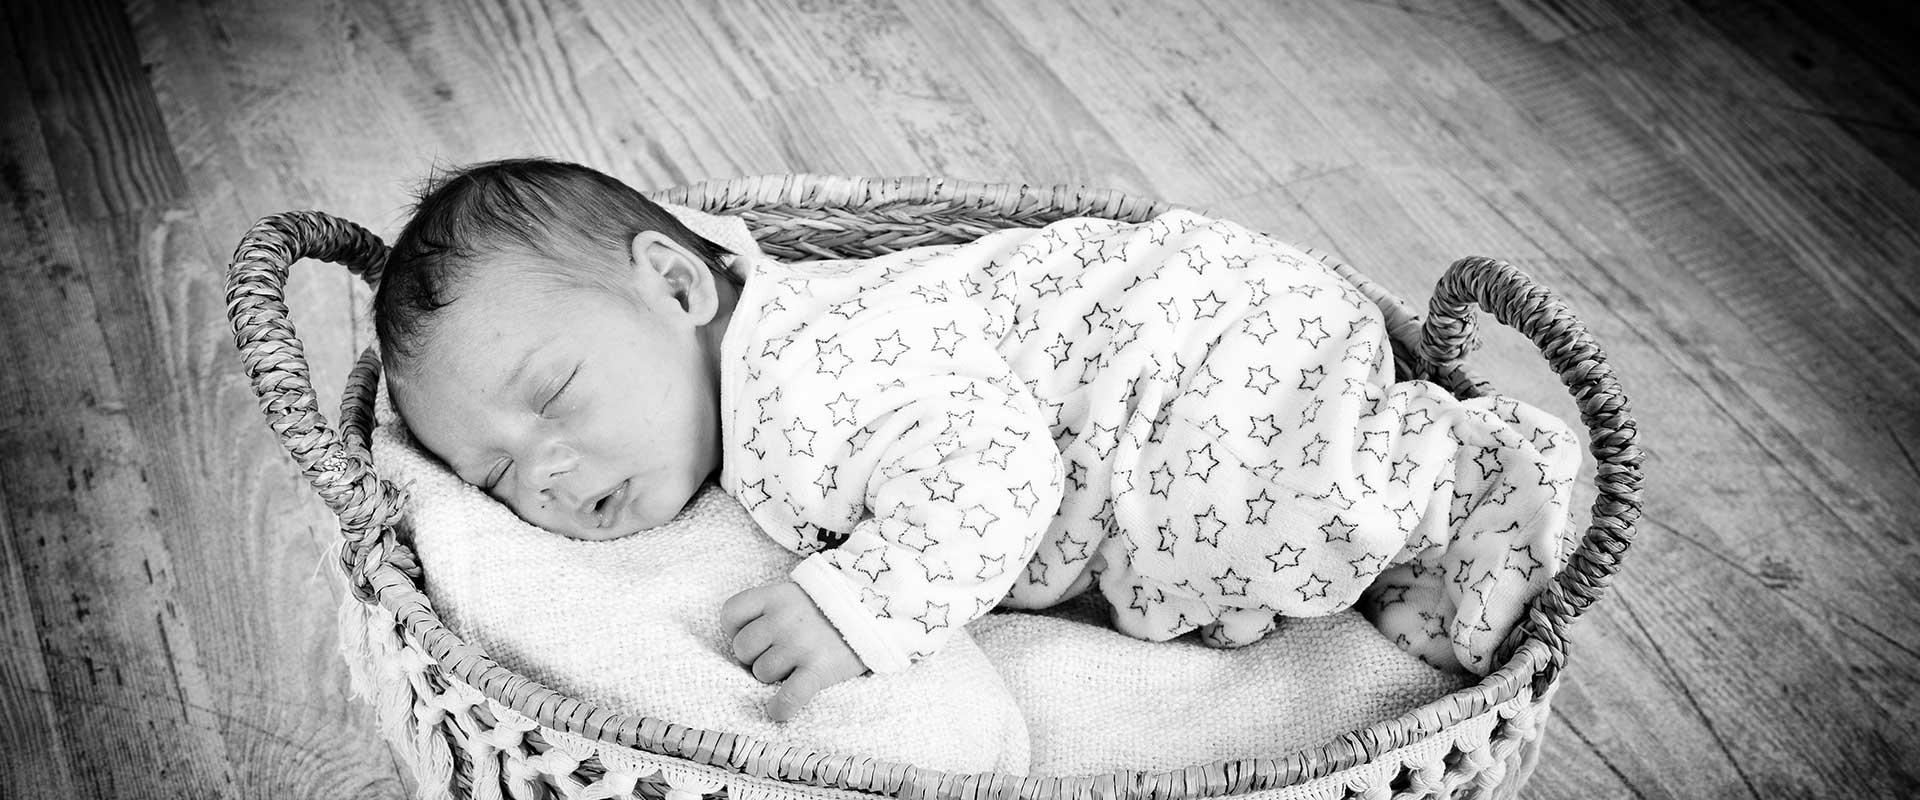 photographe-bébé-villers-calvados